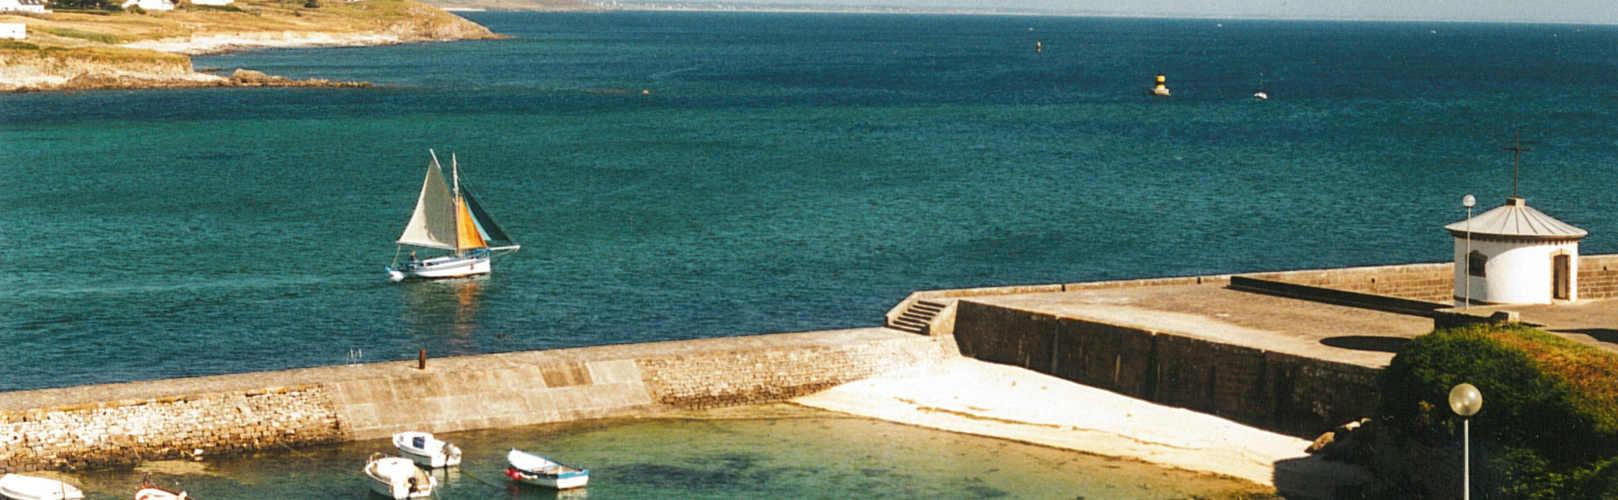 Location vacances Audierne - en bord de mer